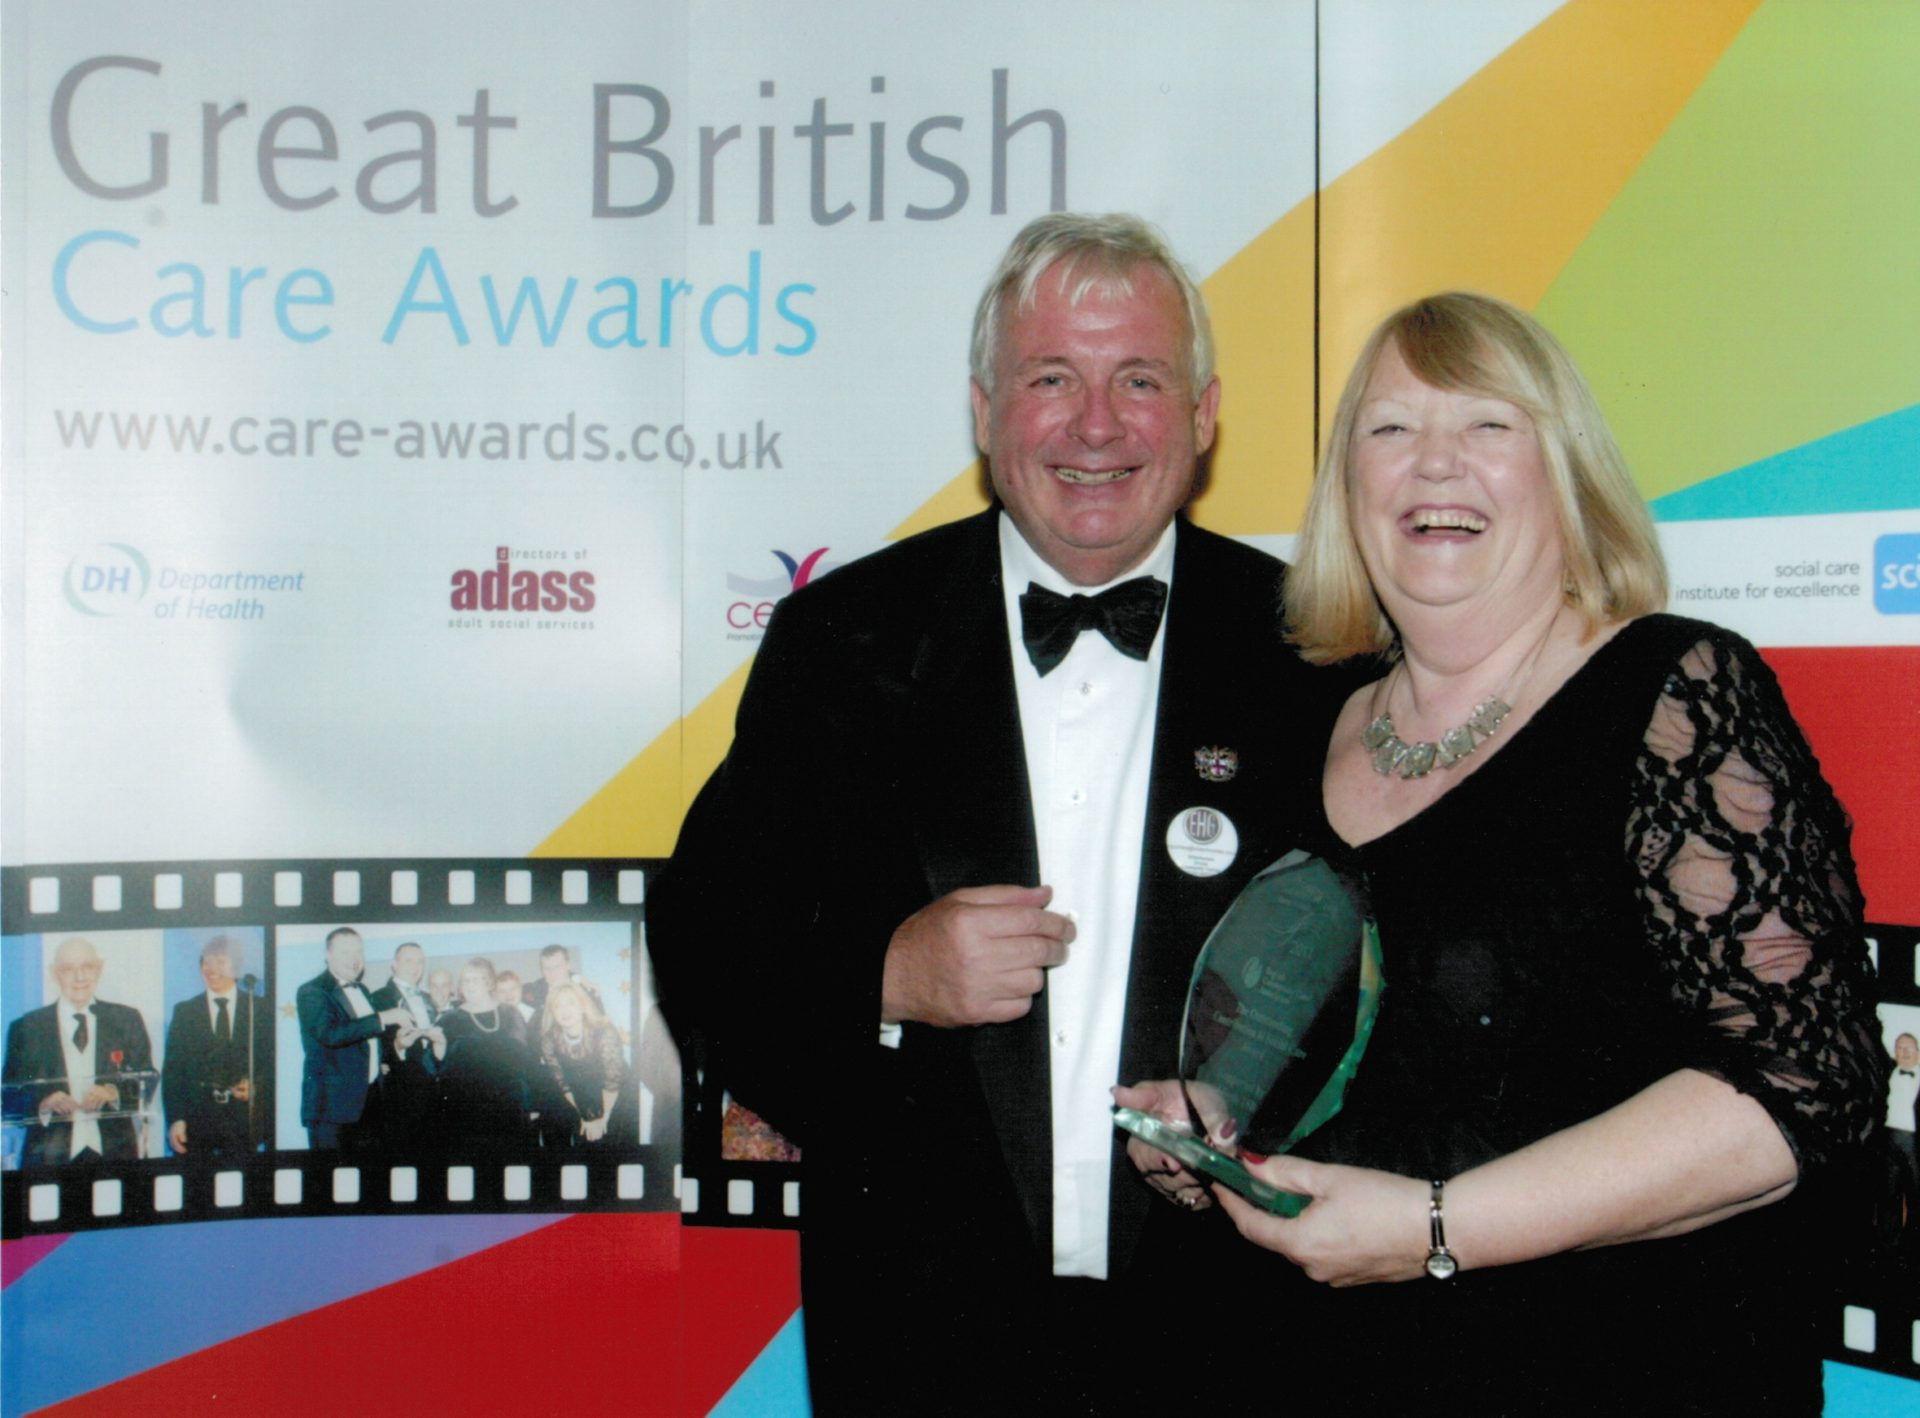 Erica Lockhart – Great British Care Awards